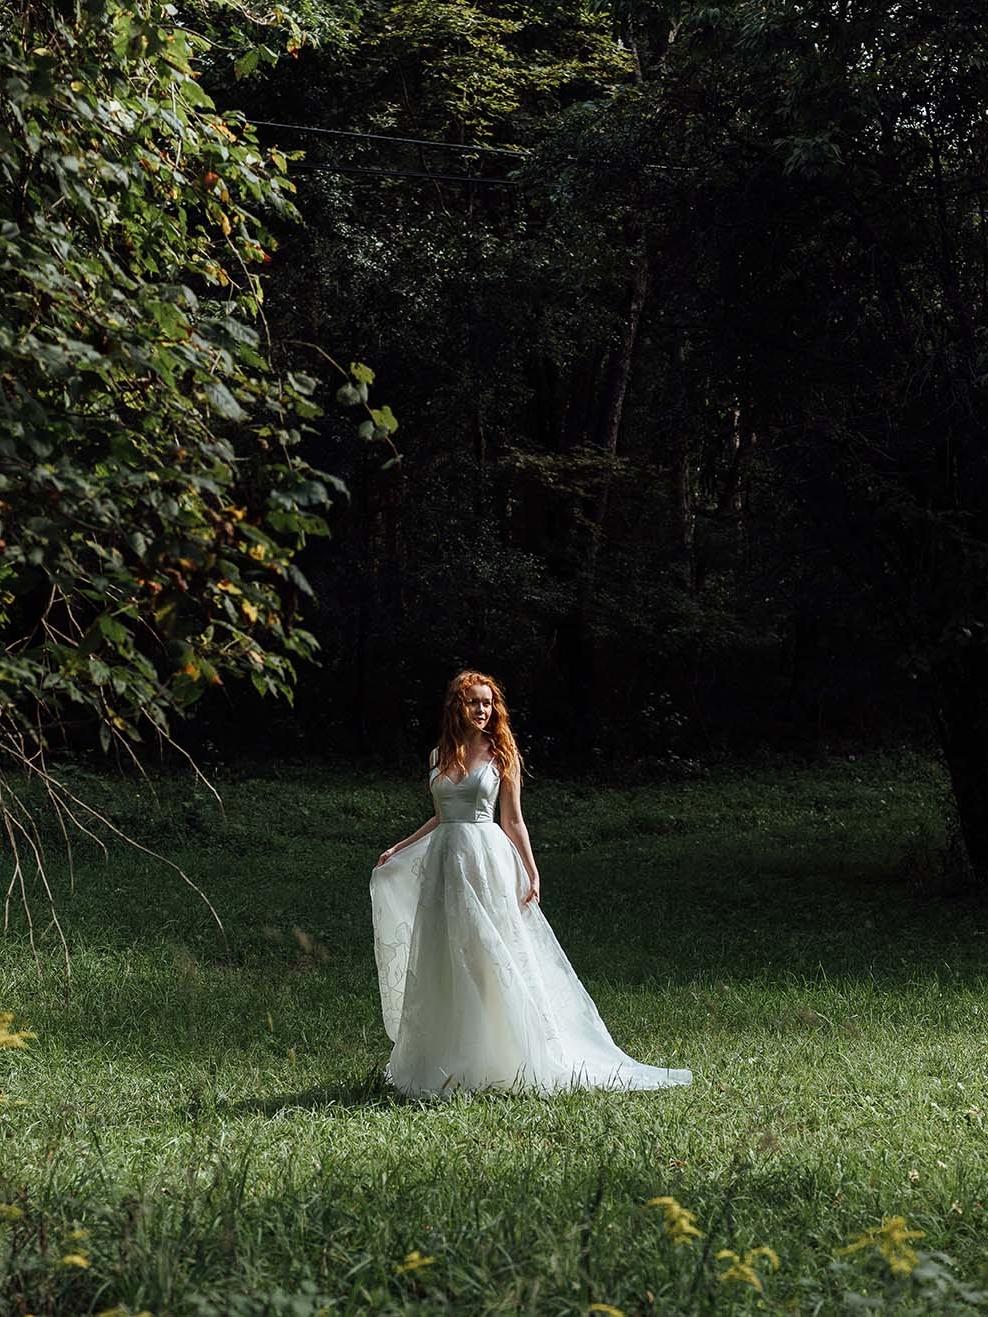 WSPCo-Gather-Greene-Rebecca-Schoneveld-Bridal-449_brooklyn_bride_upstate_wedding_style_floral_pattern.jpg